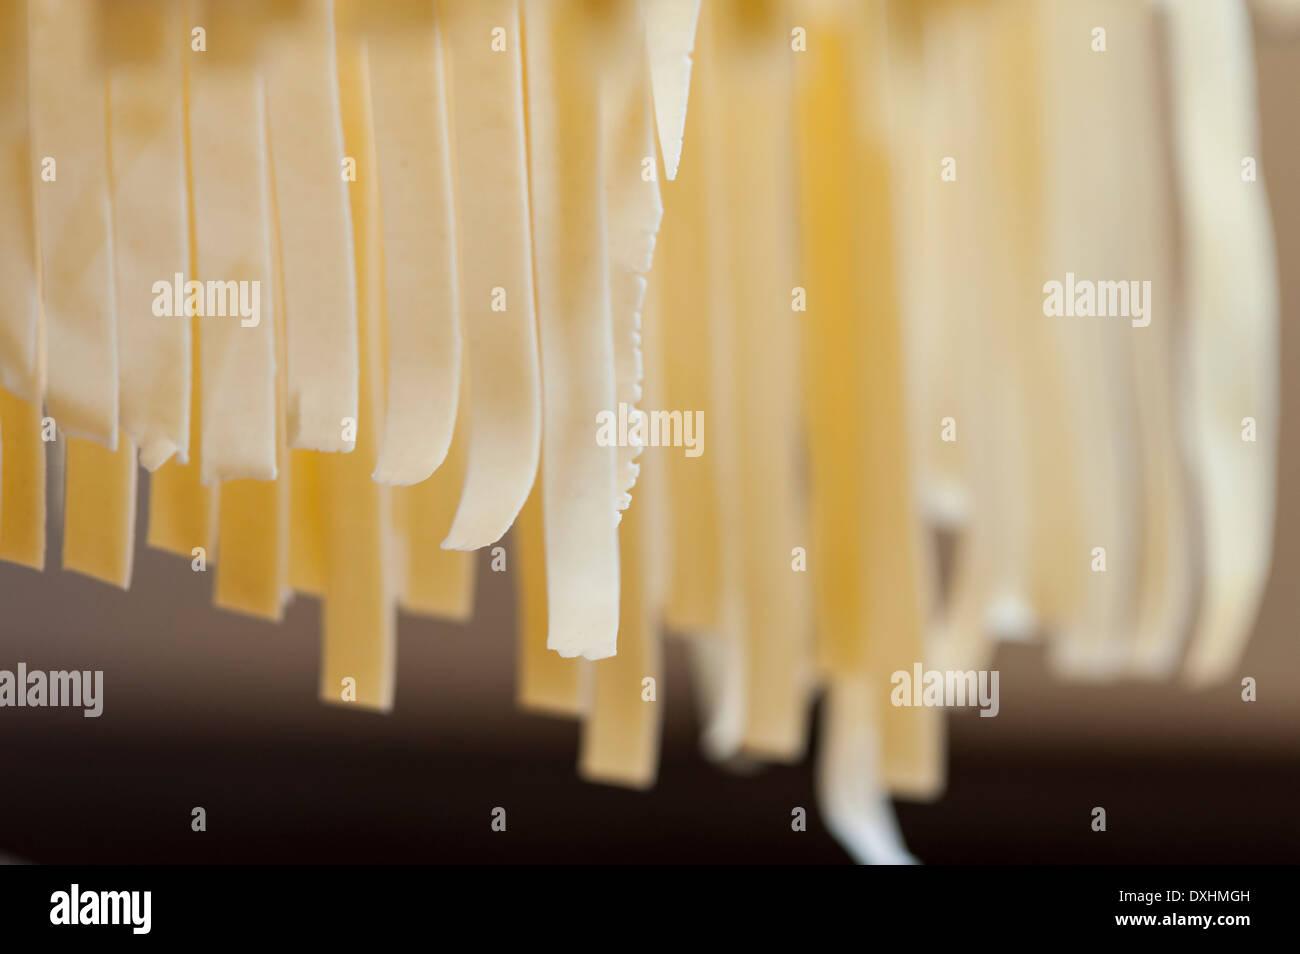 Fresh handmade Italian pasta hanging off a rack before cooking - Stock Image